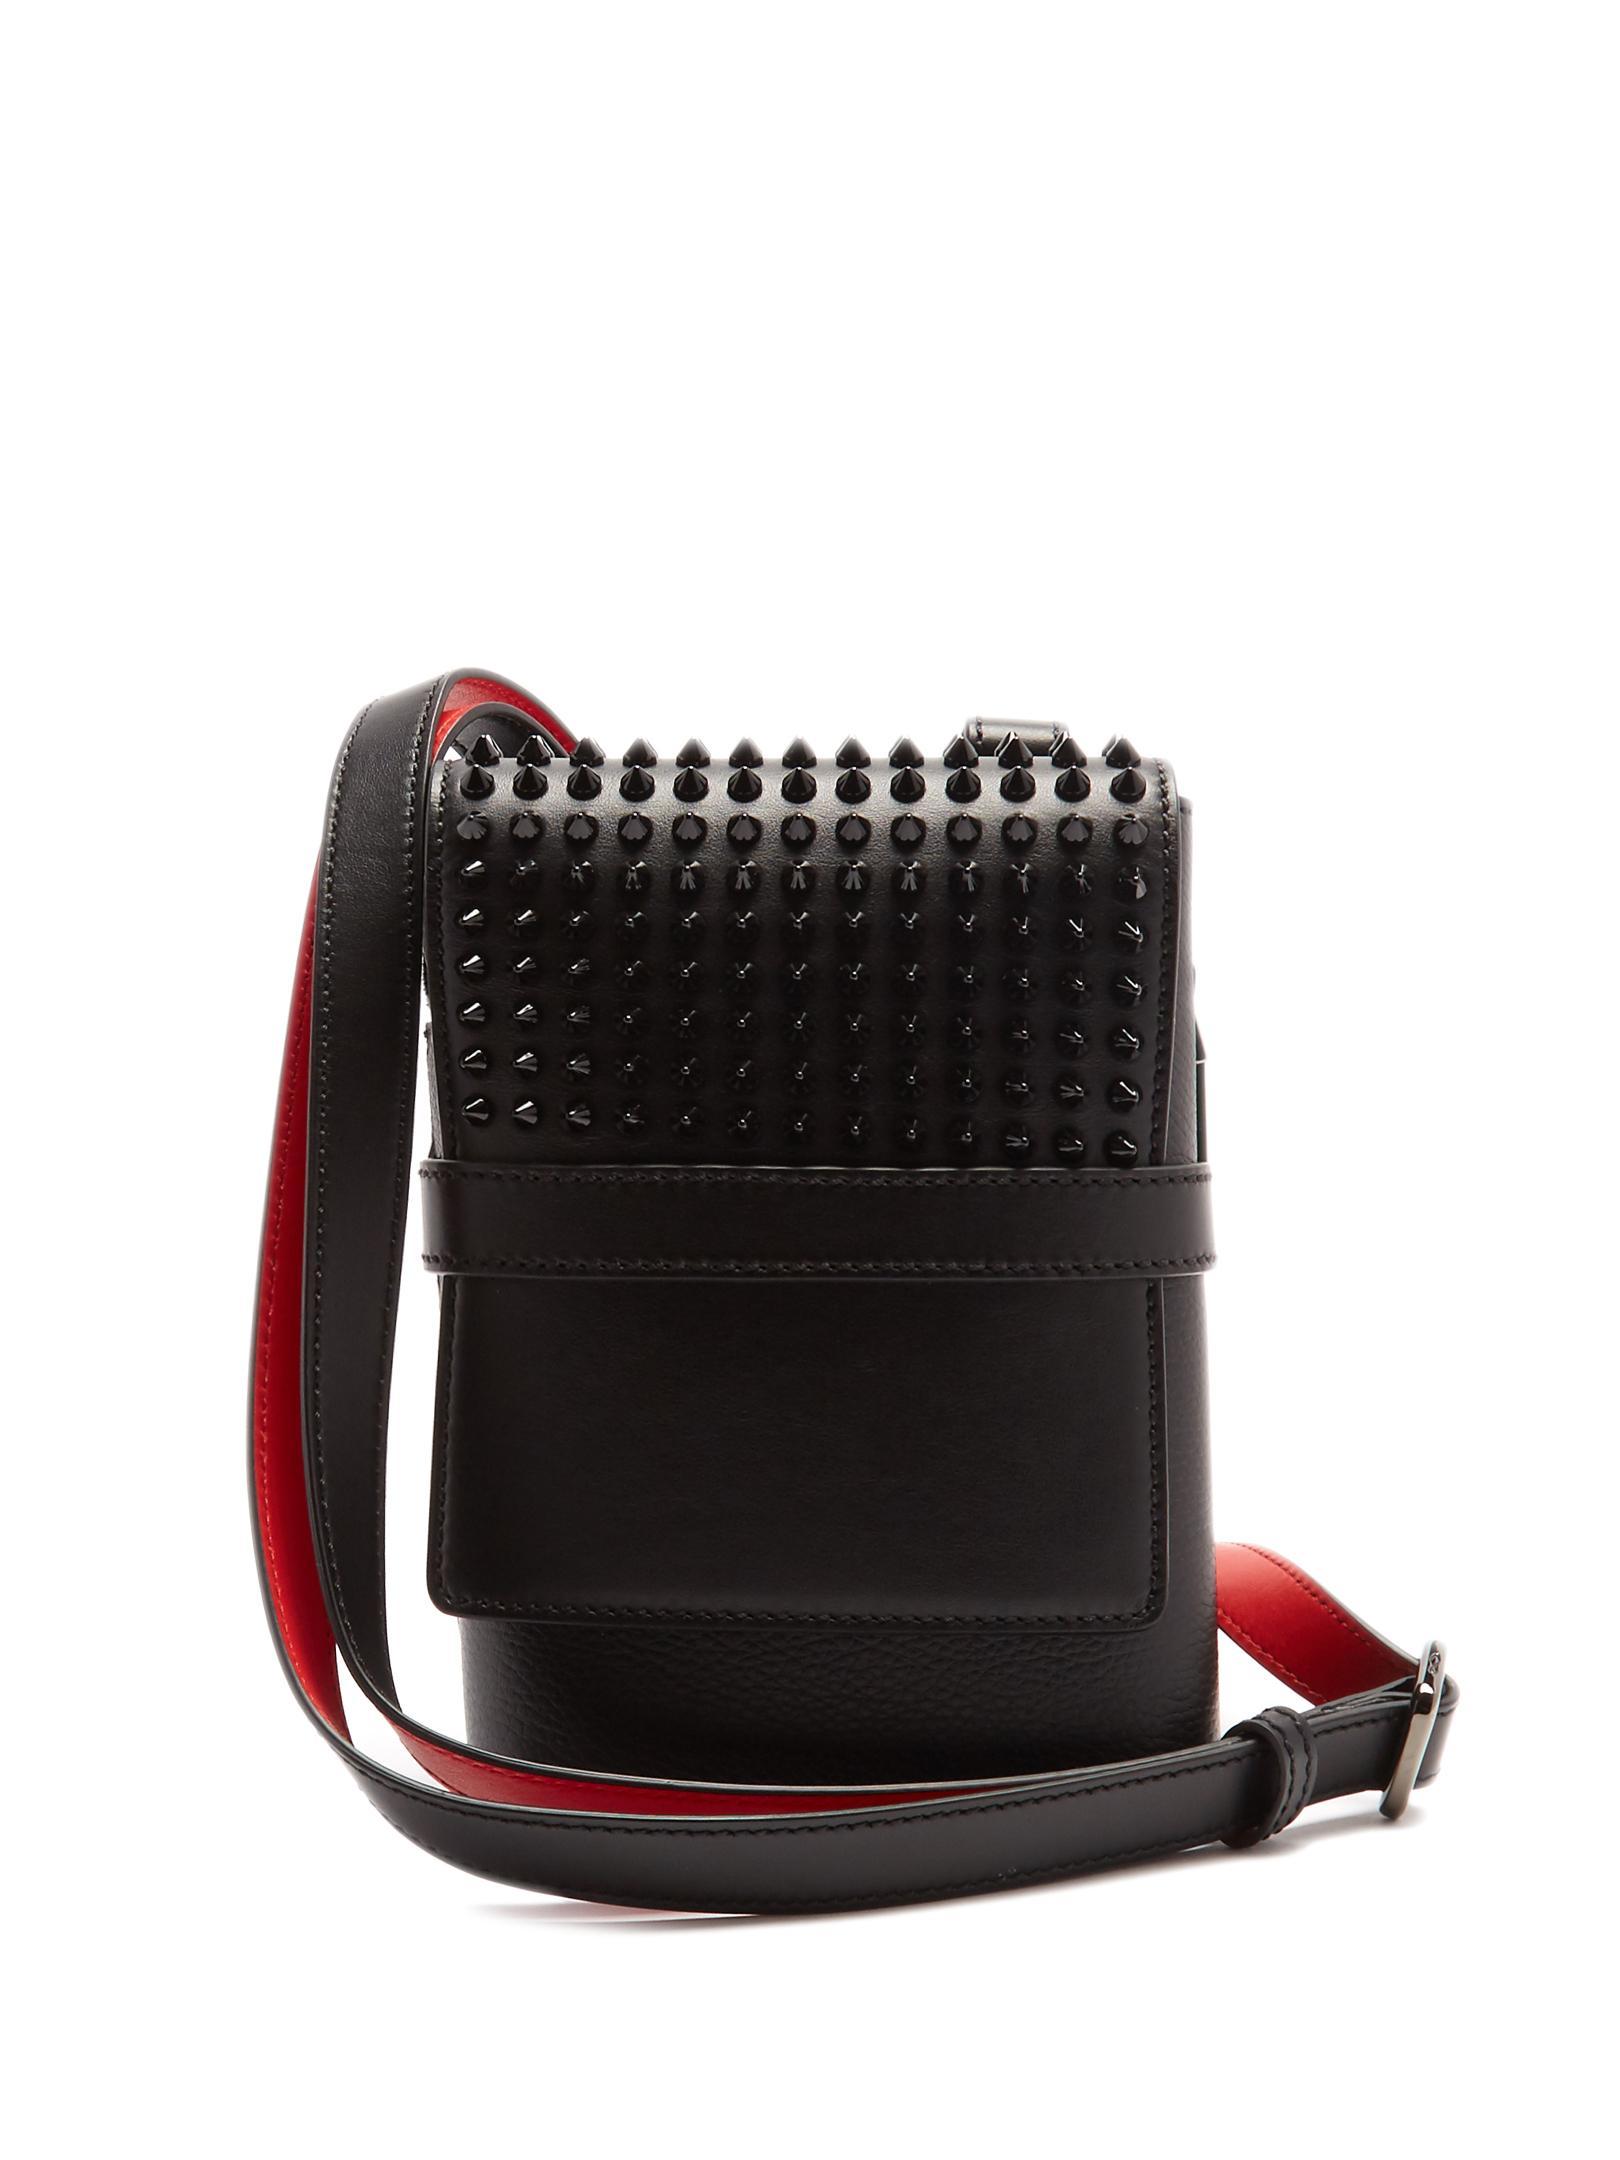 fd8dc665df945 Christian Louboutin Benech Reporter Leather Messenger Bag in Black ...